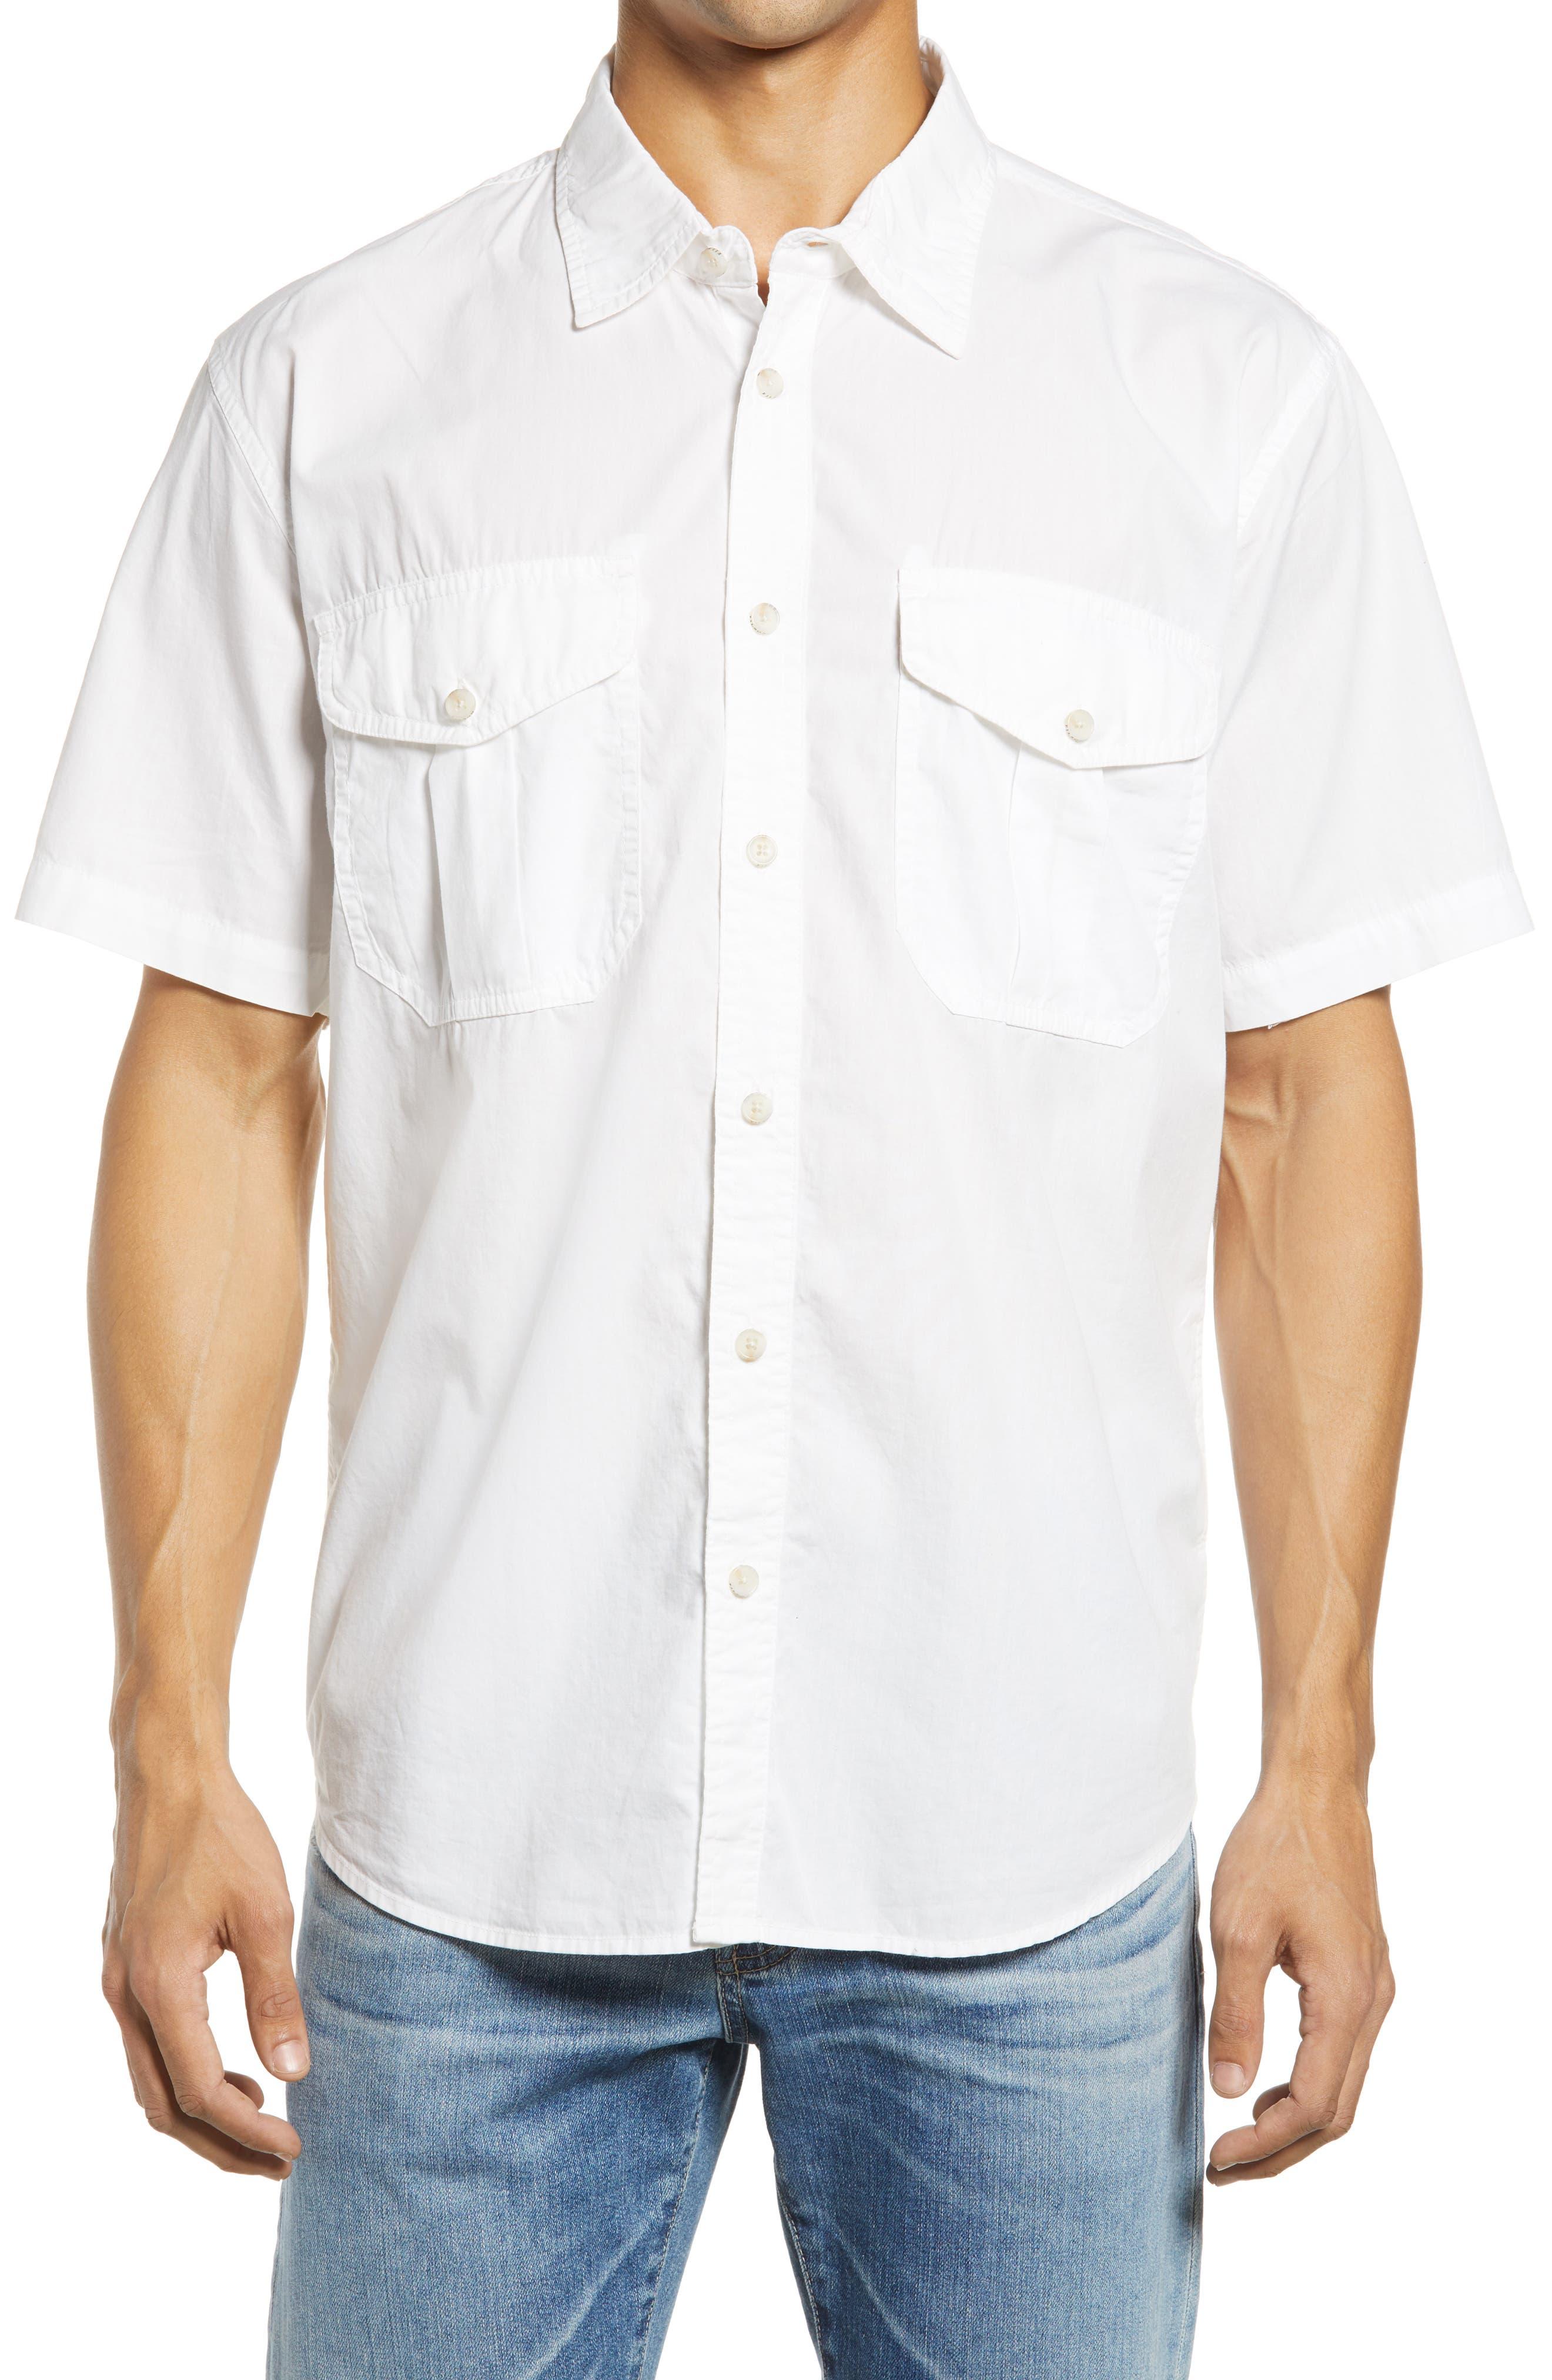 Men's Feather Cloth Short Sleeve Button-Up Shirt